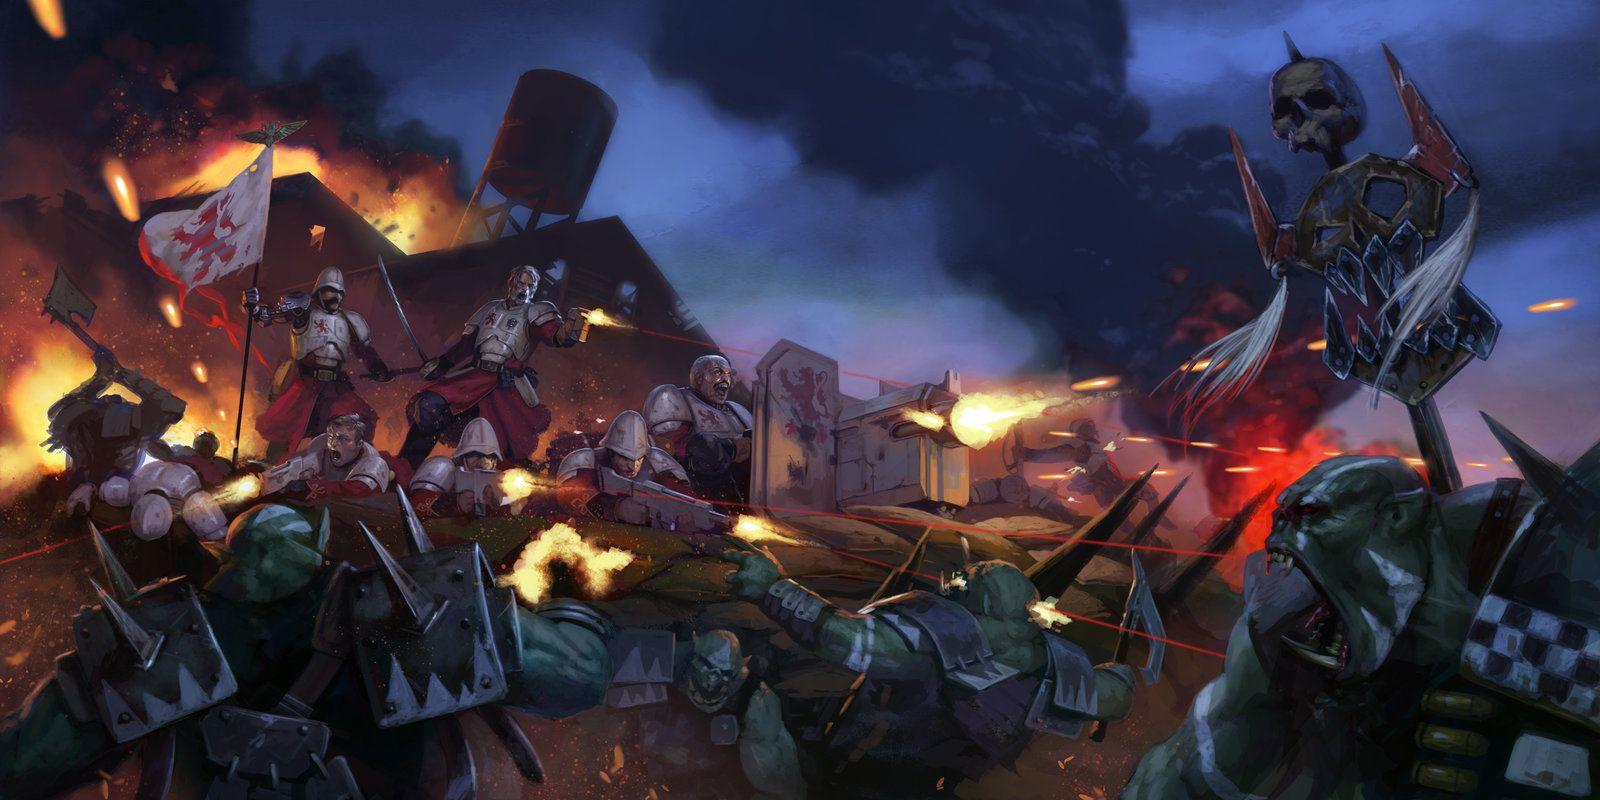 Praetorian XVI's last stand by DiegoGisbertLlorens.deviantart.com on @DeviantArt